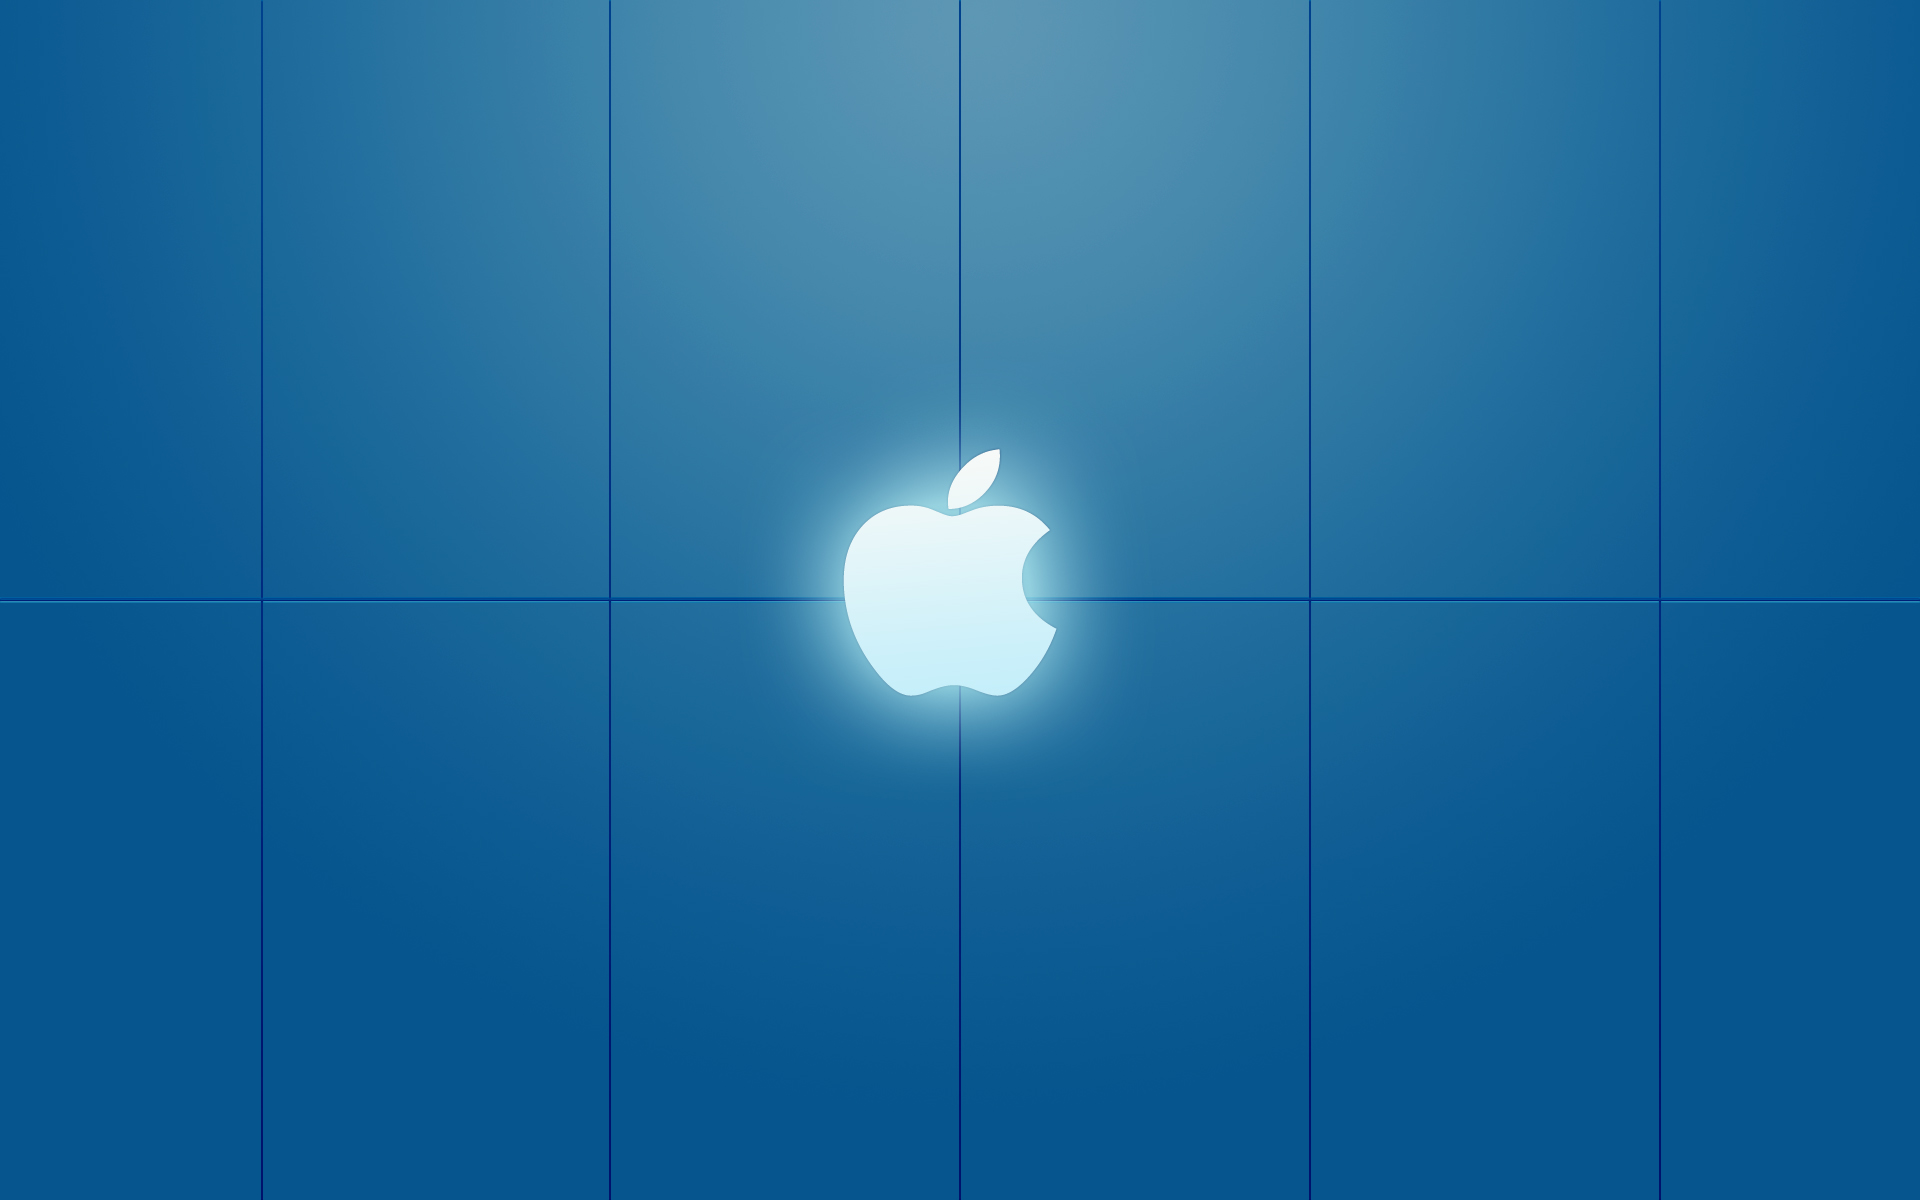 50 Inspiring Apple Mac amp iPad Wallpapers For Download 1920x1200